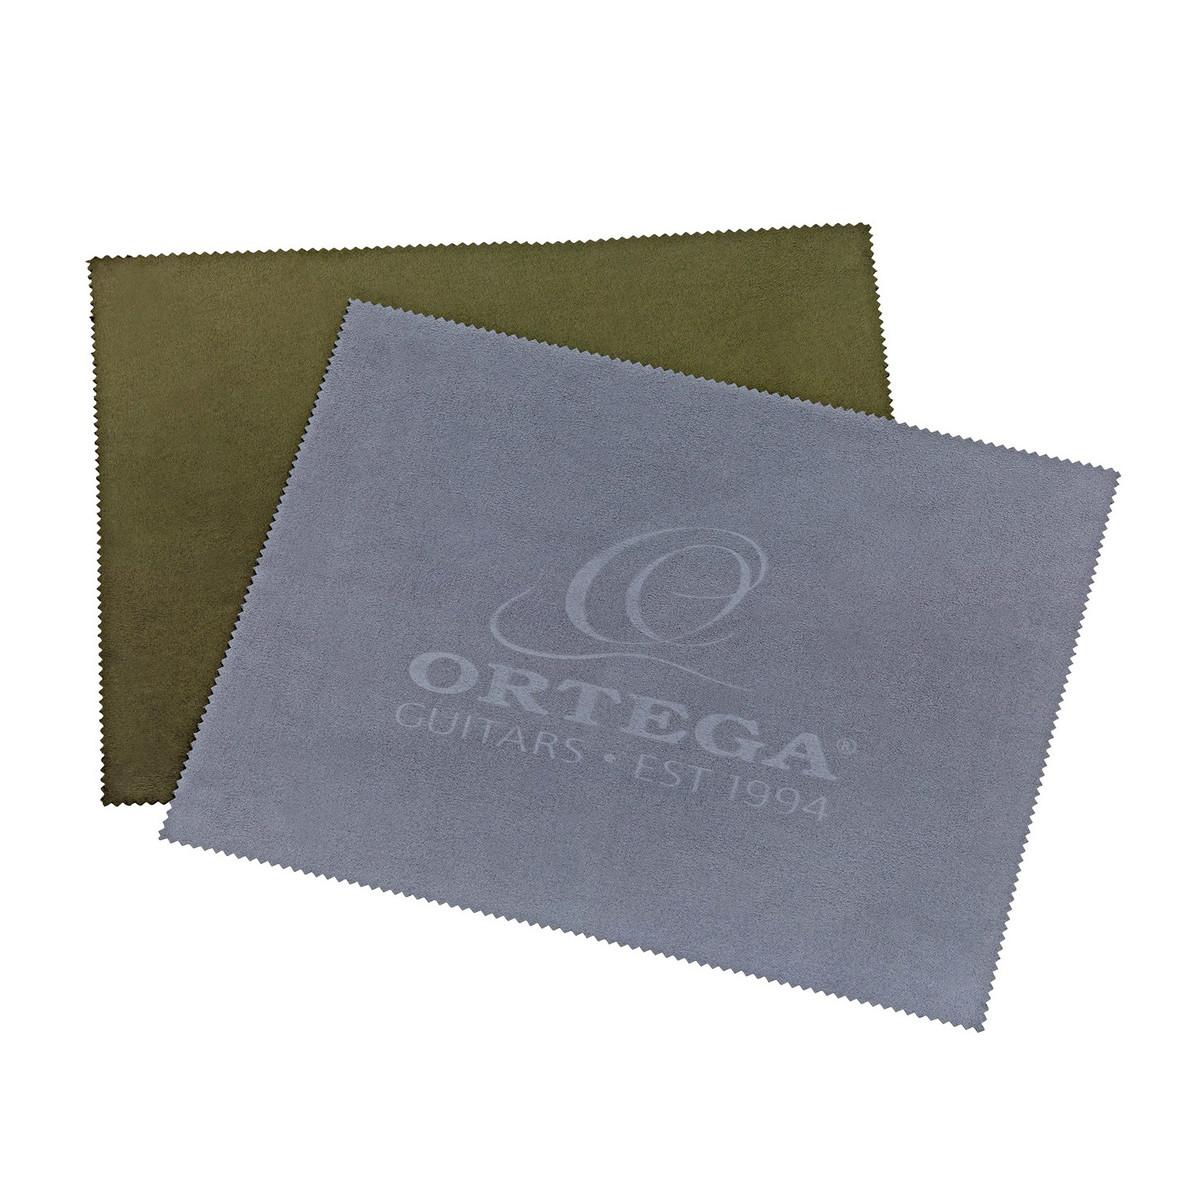 Microfiber Cloth Jb Hi Fi: Ortega OPC-GR/LG Microfiber Polishing Cloth, 2 Pack At